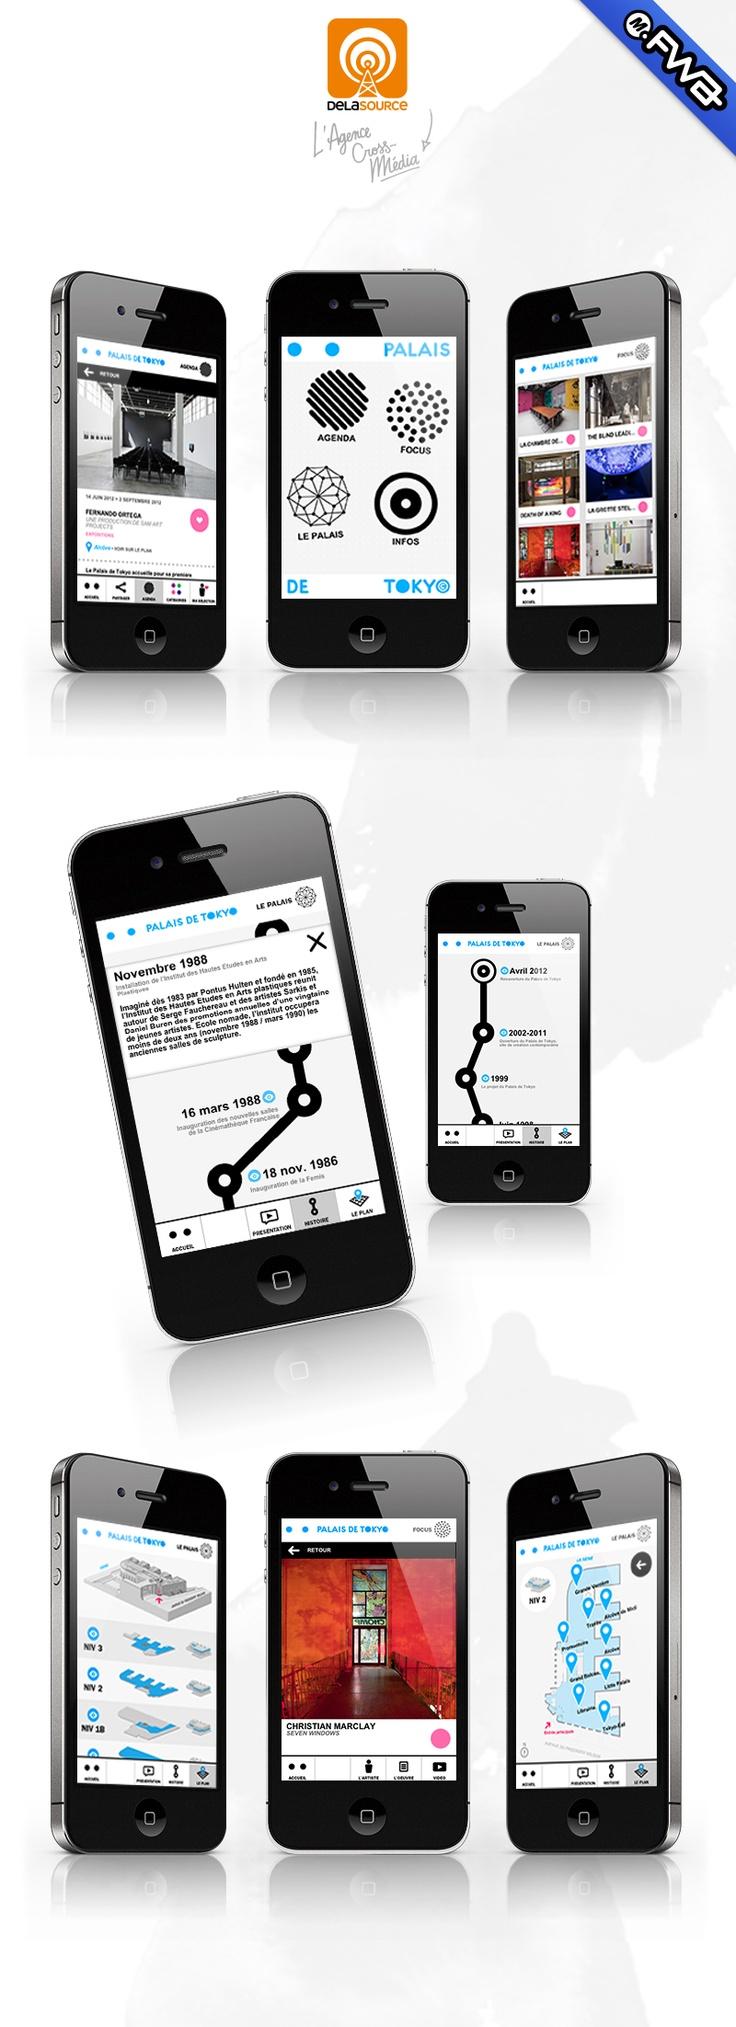 Palais de Tokyo app: designed and powered by © Delasource  (Palais de Tokyo / Orange) FWA : Mobile of the day award